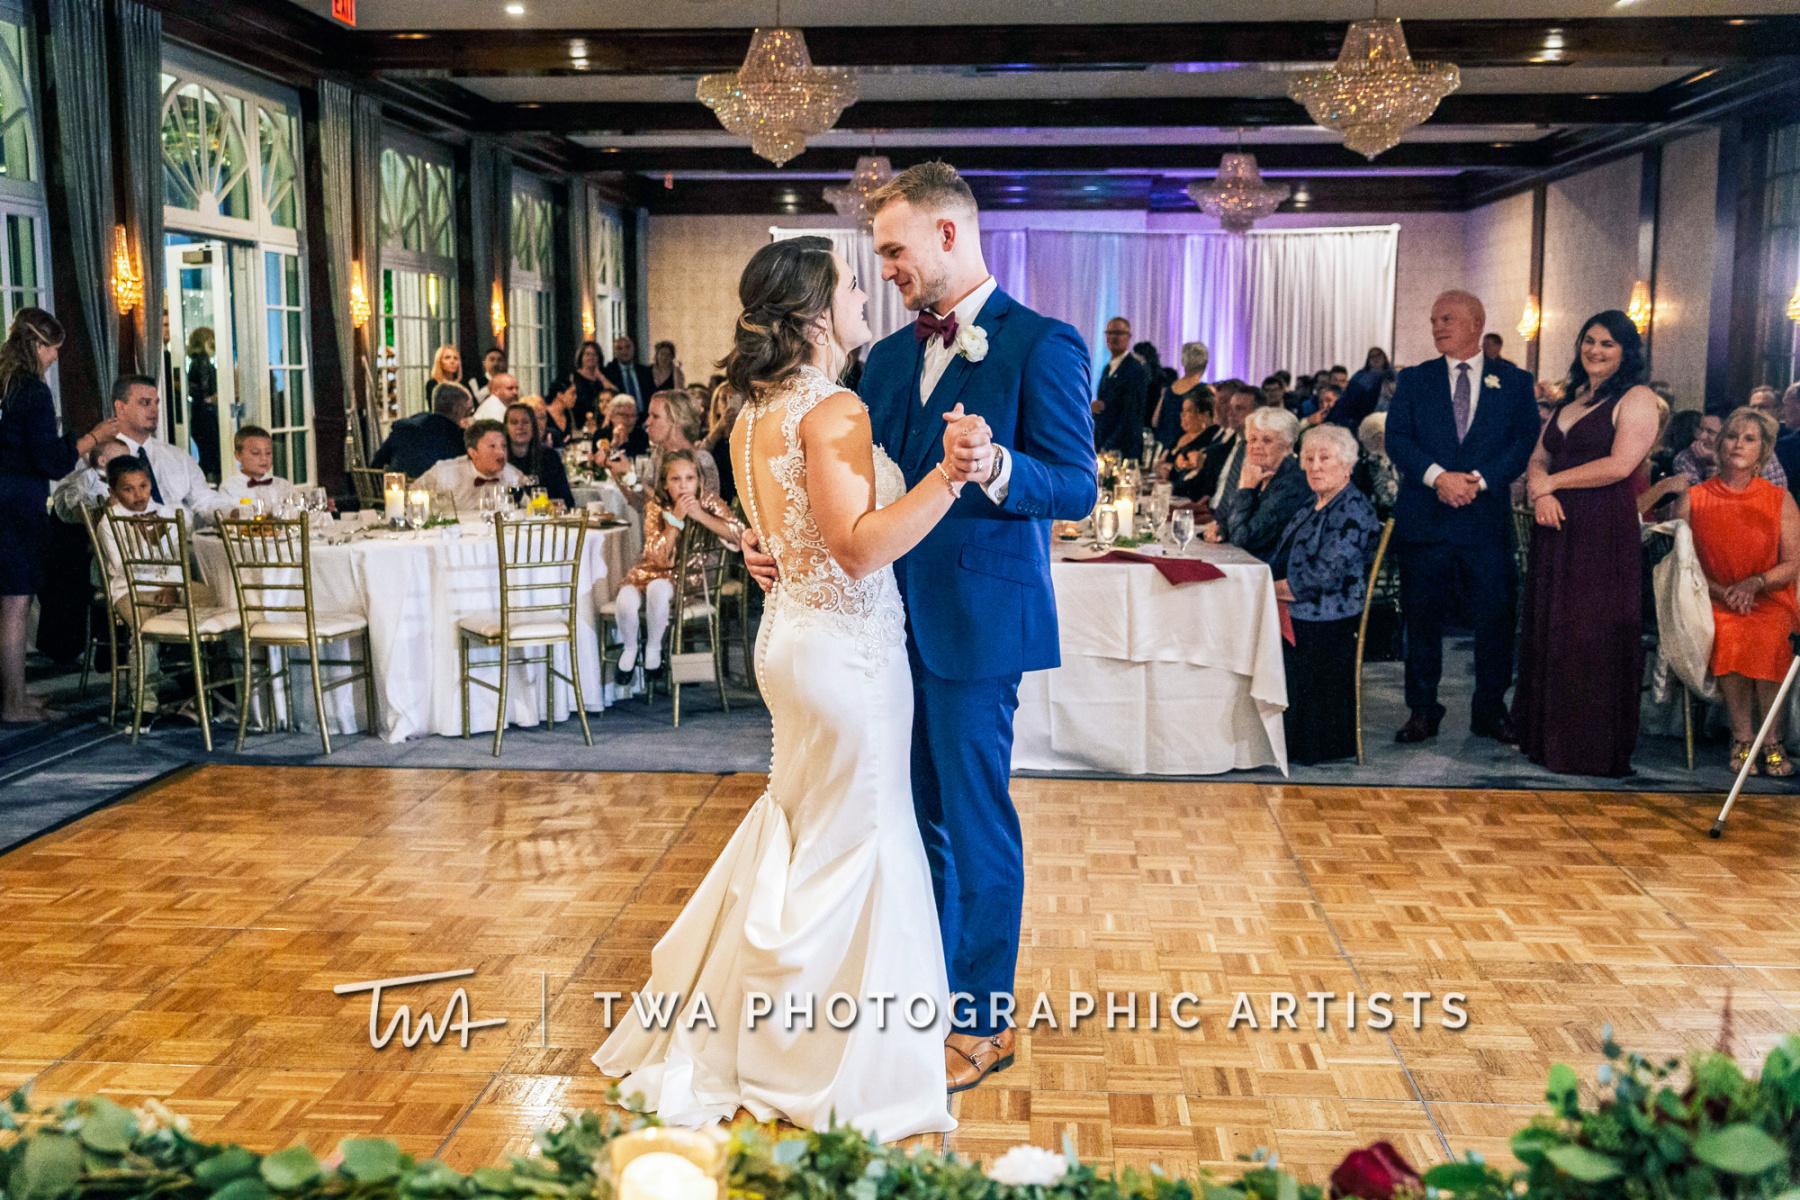 Chicago-Wedding-Photographer-TWA-Photographic-Artists-065_096-1300